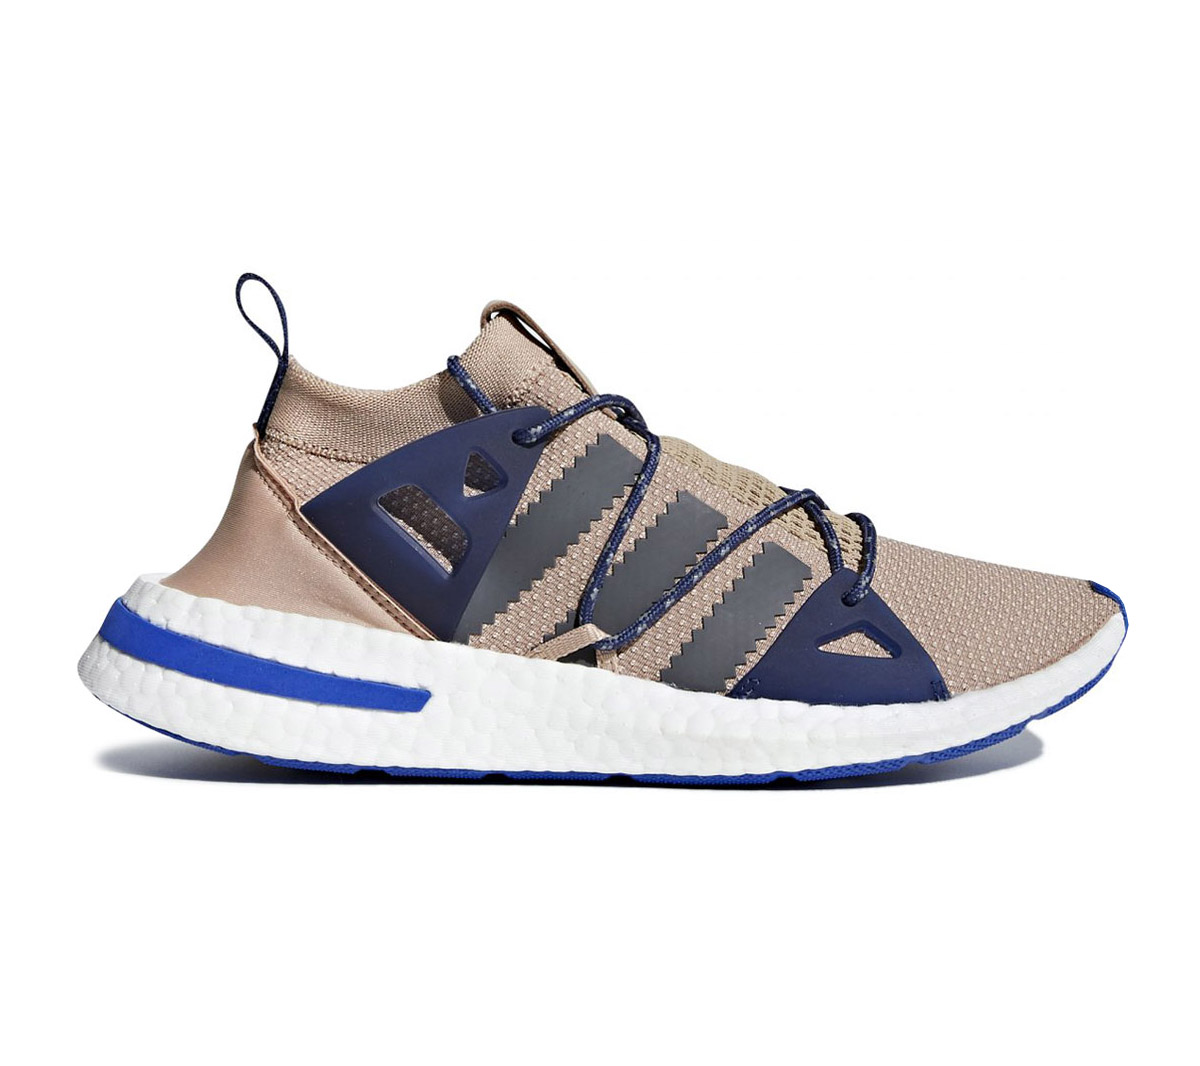 newest b37a1 d501e Adidas Originals Arkyn W Boost Ladies Sneaker Shoes Beige Da